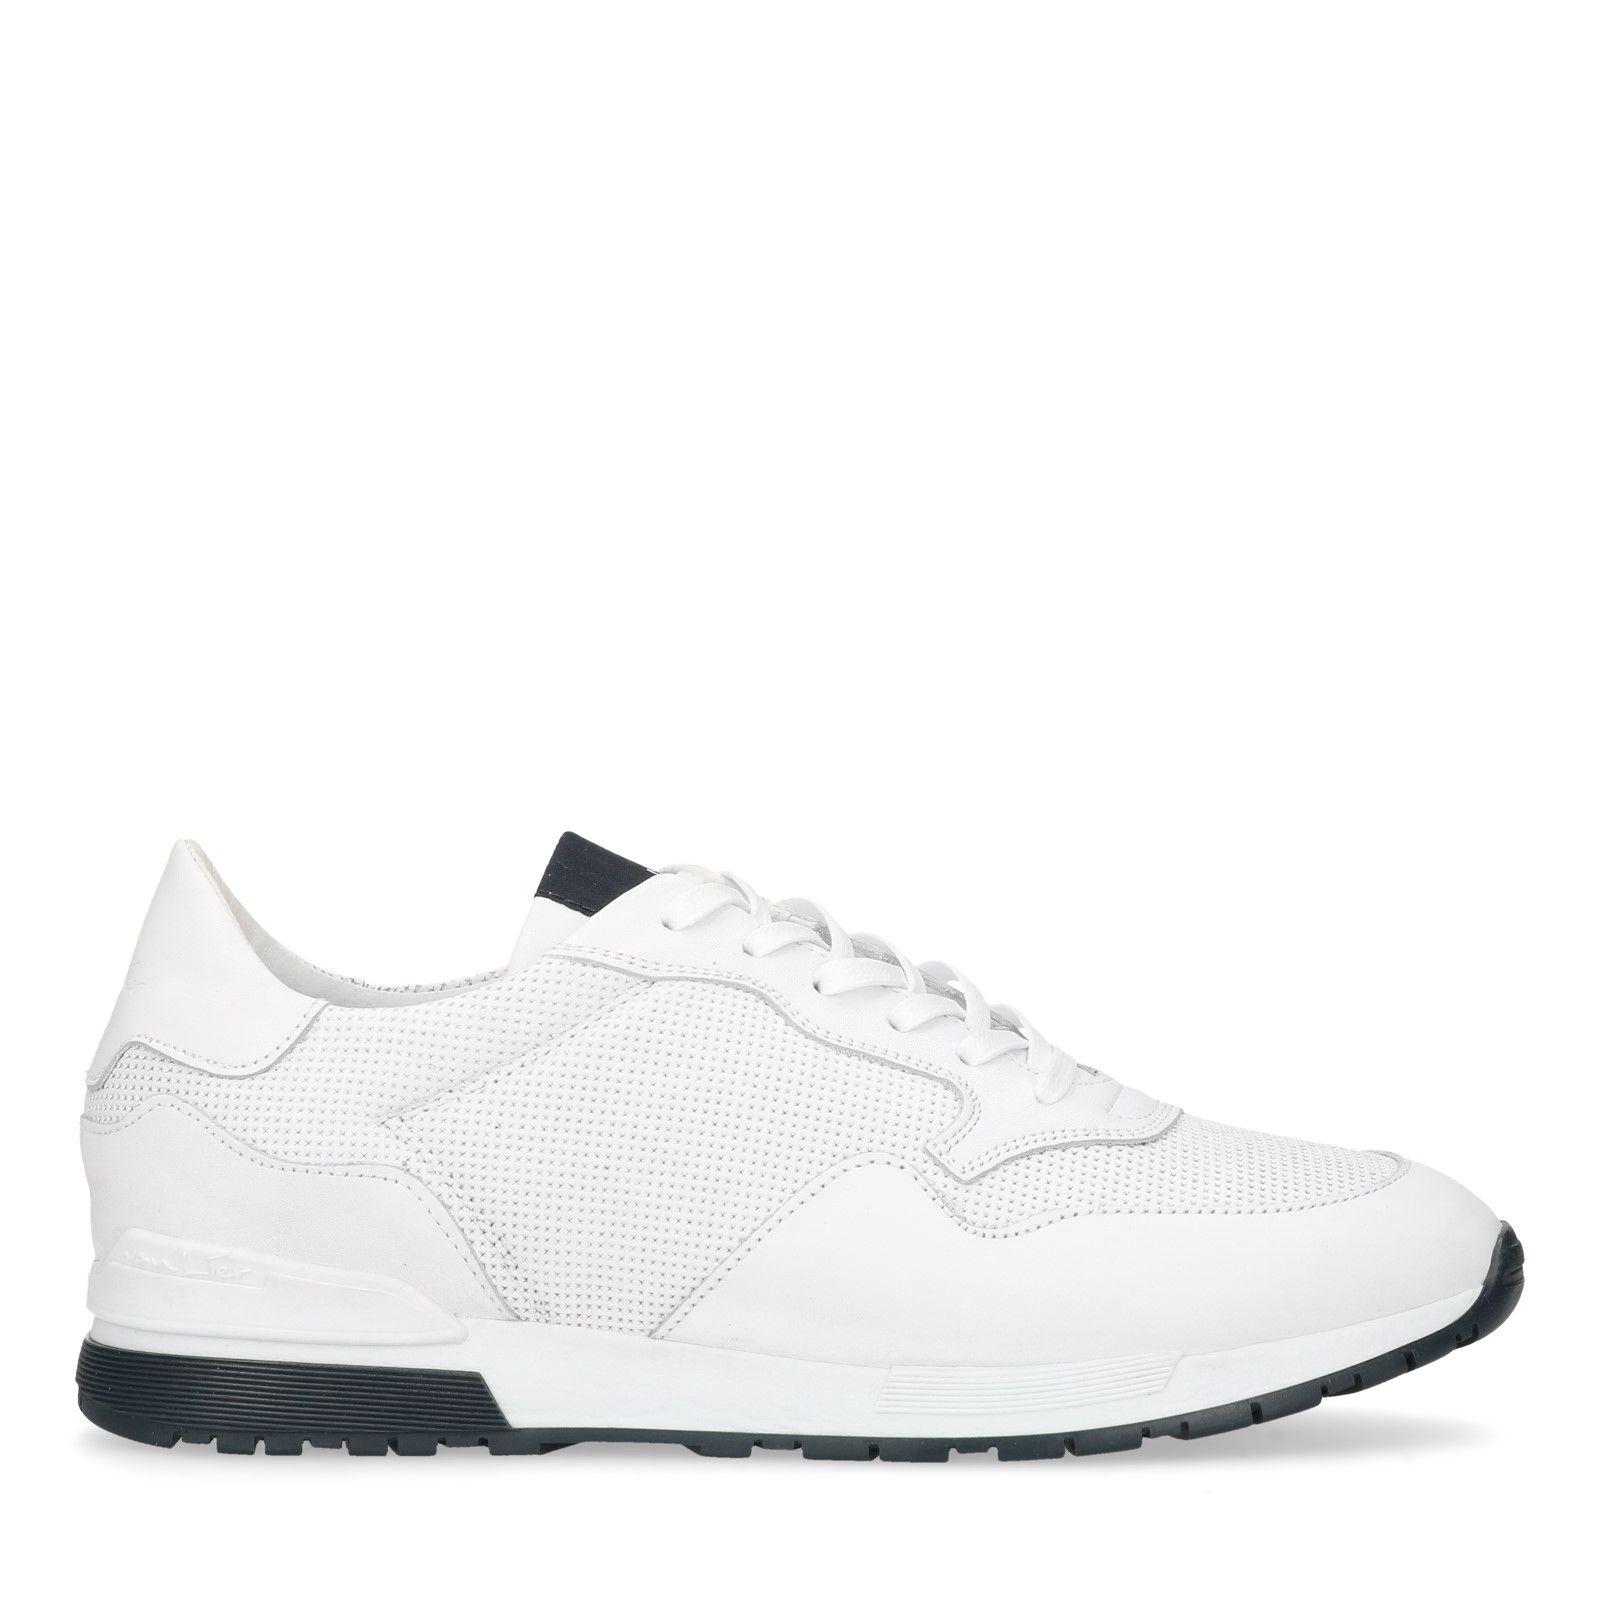 Witte Sneakers Sneakers Witte Witte Sneakers HerenManfield HerenManfield HerenManfield PkZuwXTOil